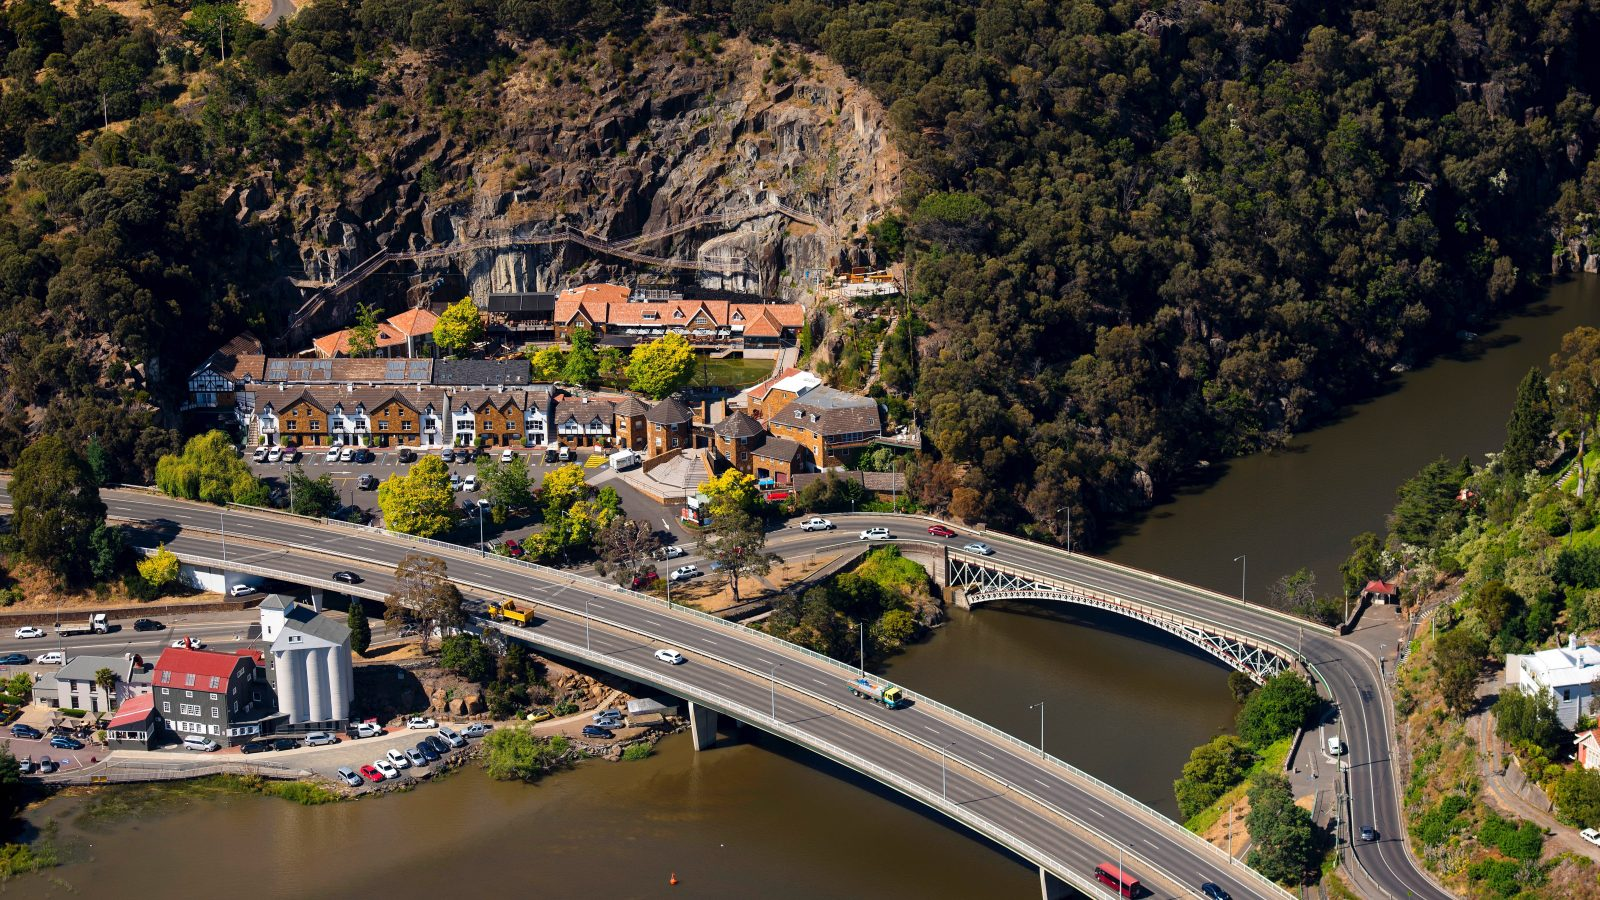 Cataract Gorge and Kings Bridge